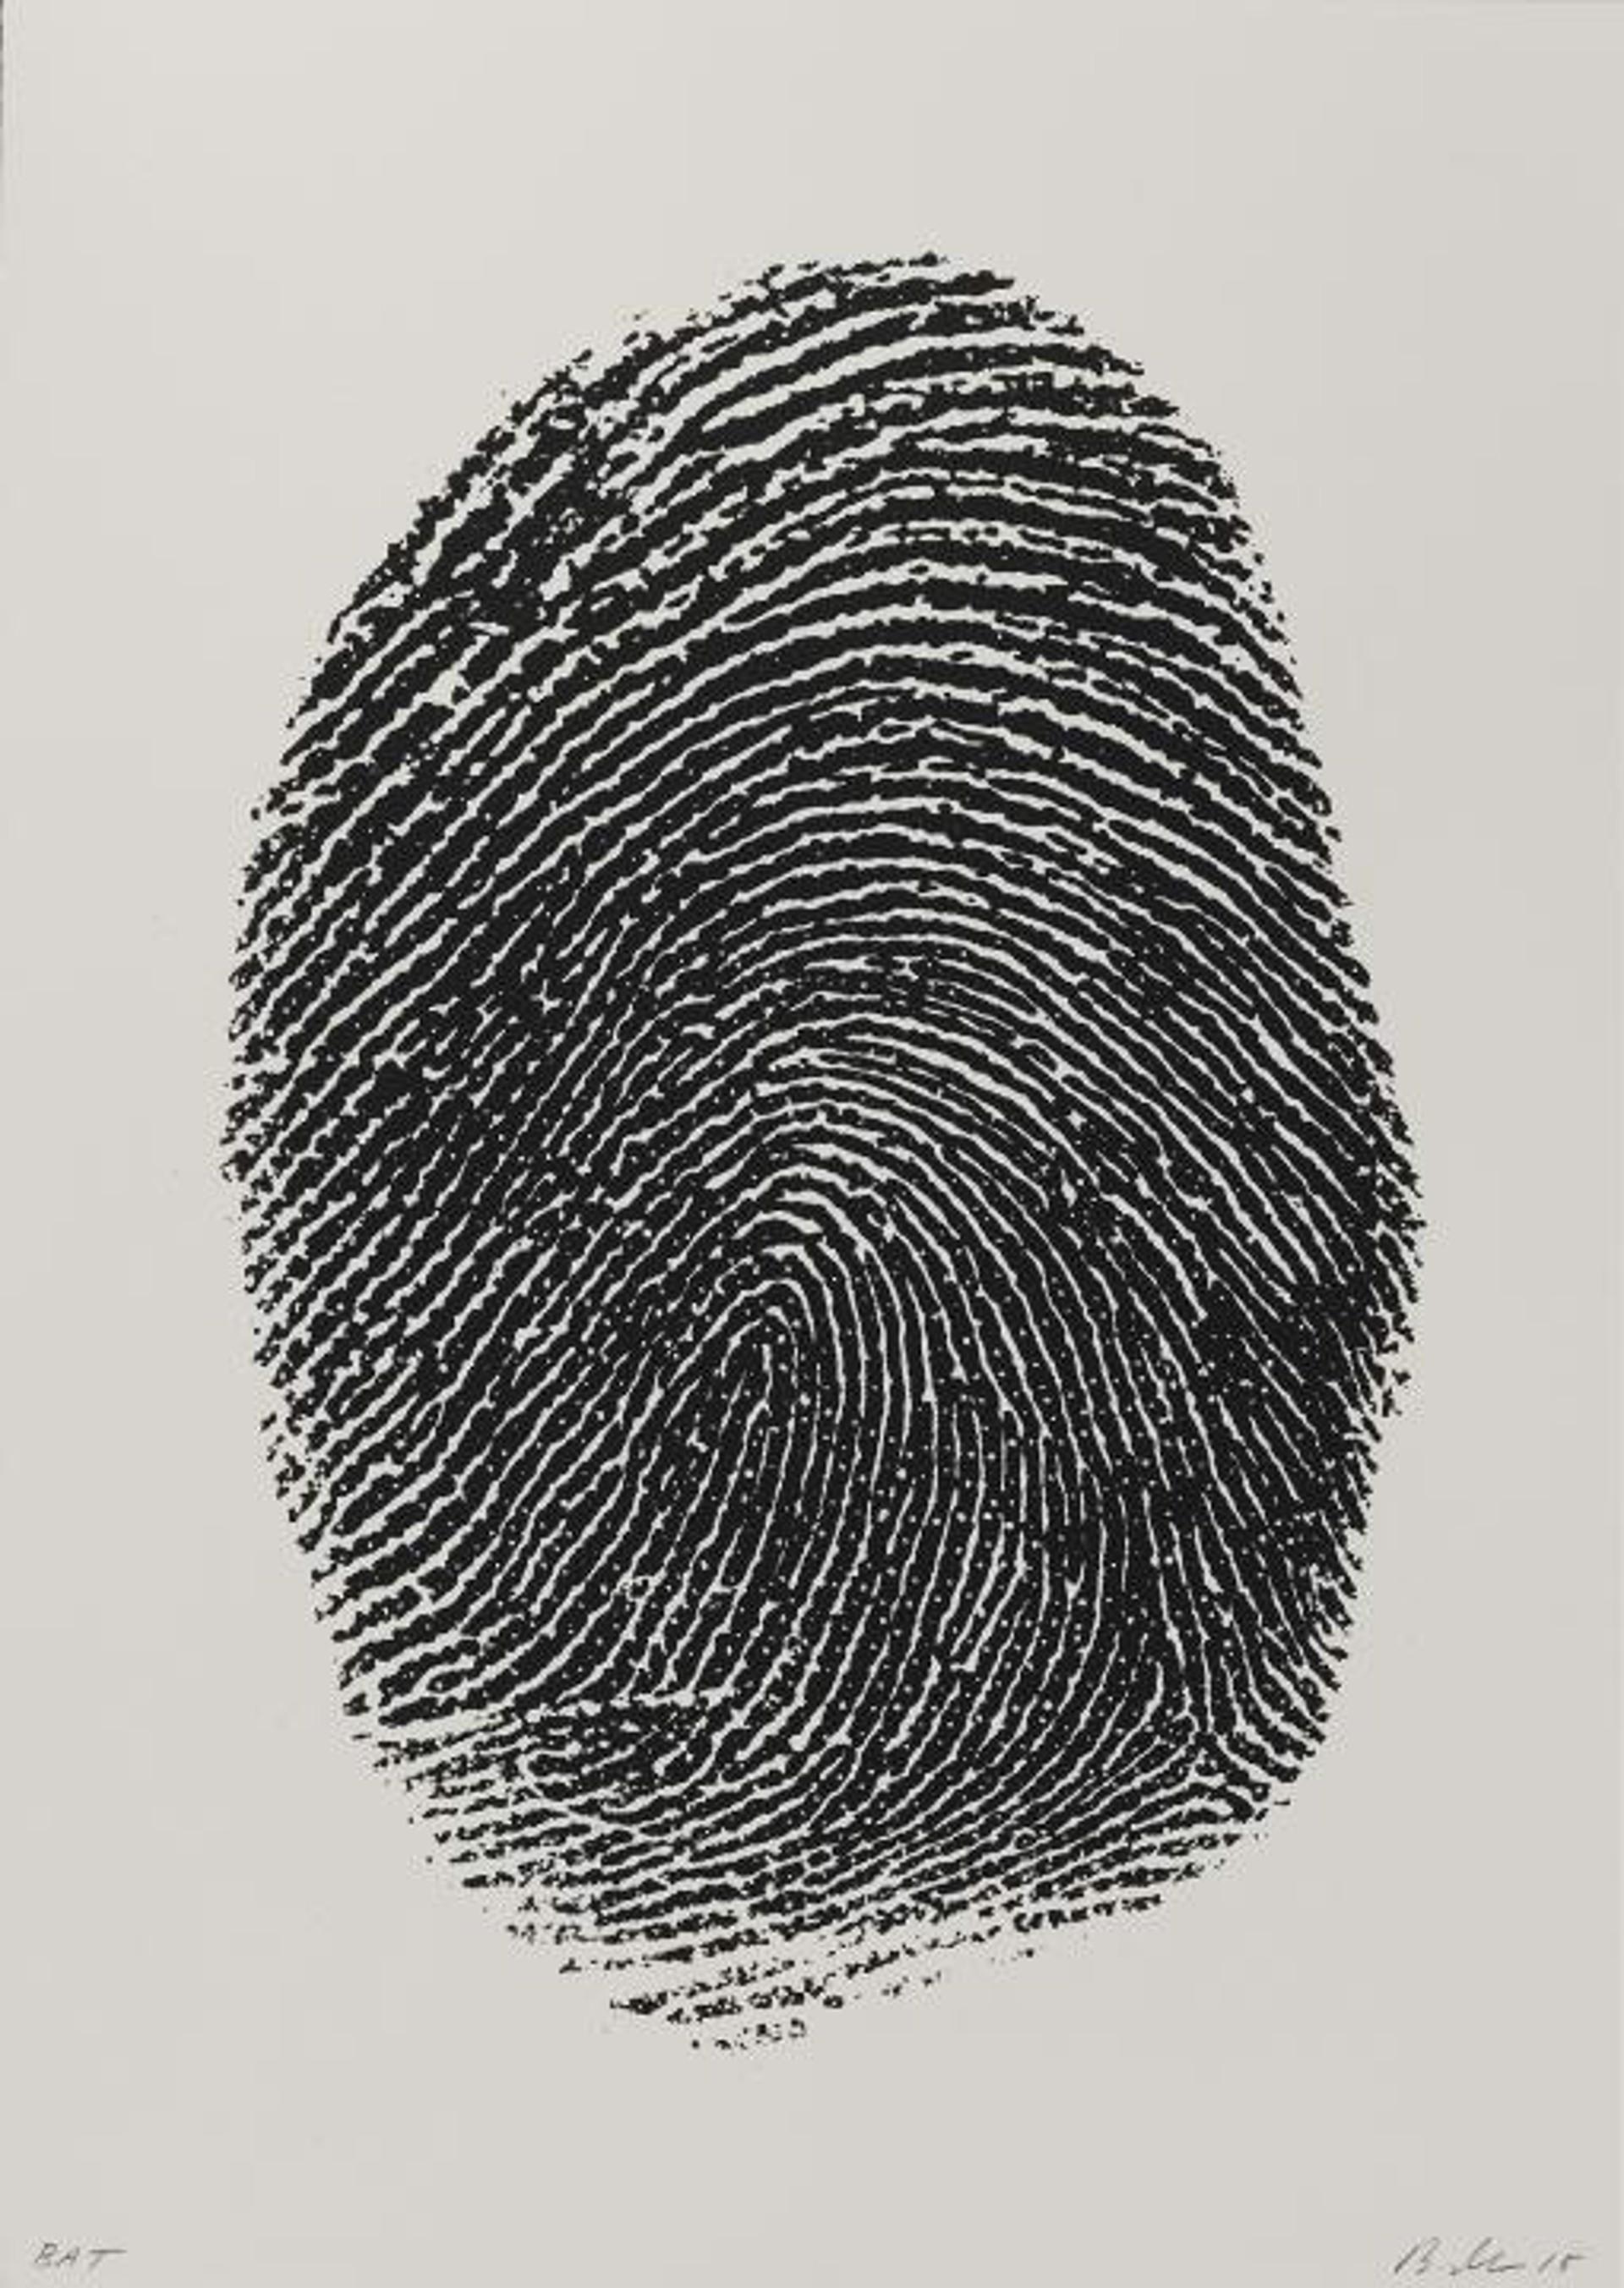 Not Manzoni (Impronte pollice sinistro, 1960) by Mike Bidlo